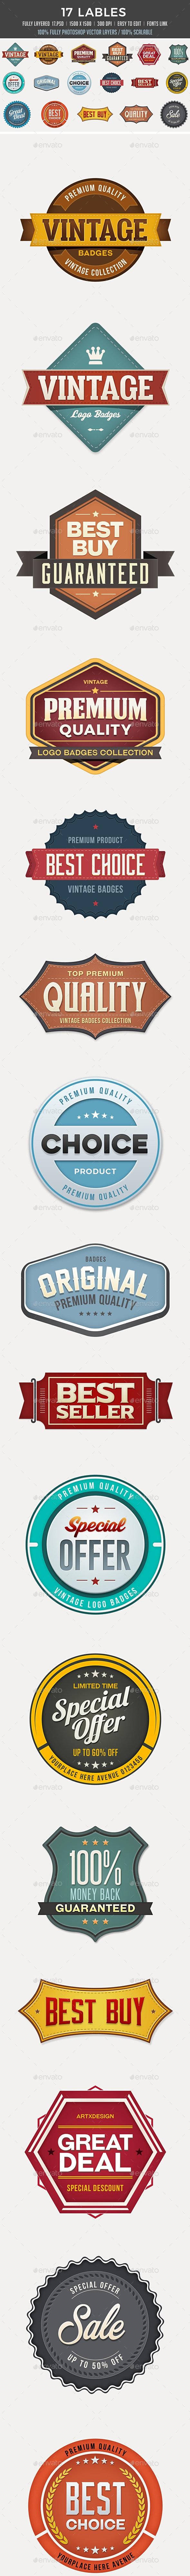 17 Badges - Badges & Stickers Web Elements